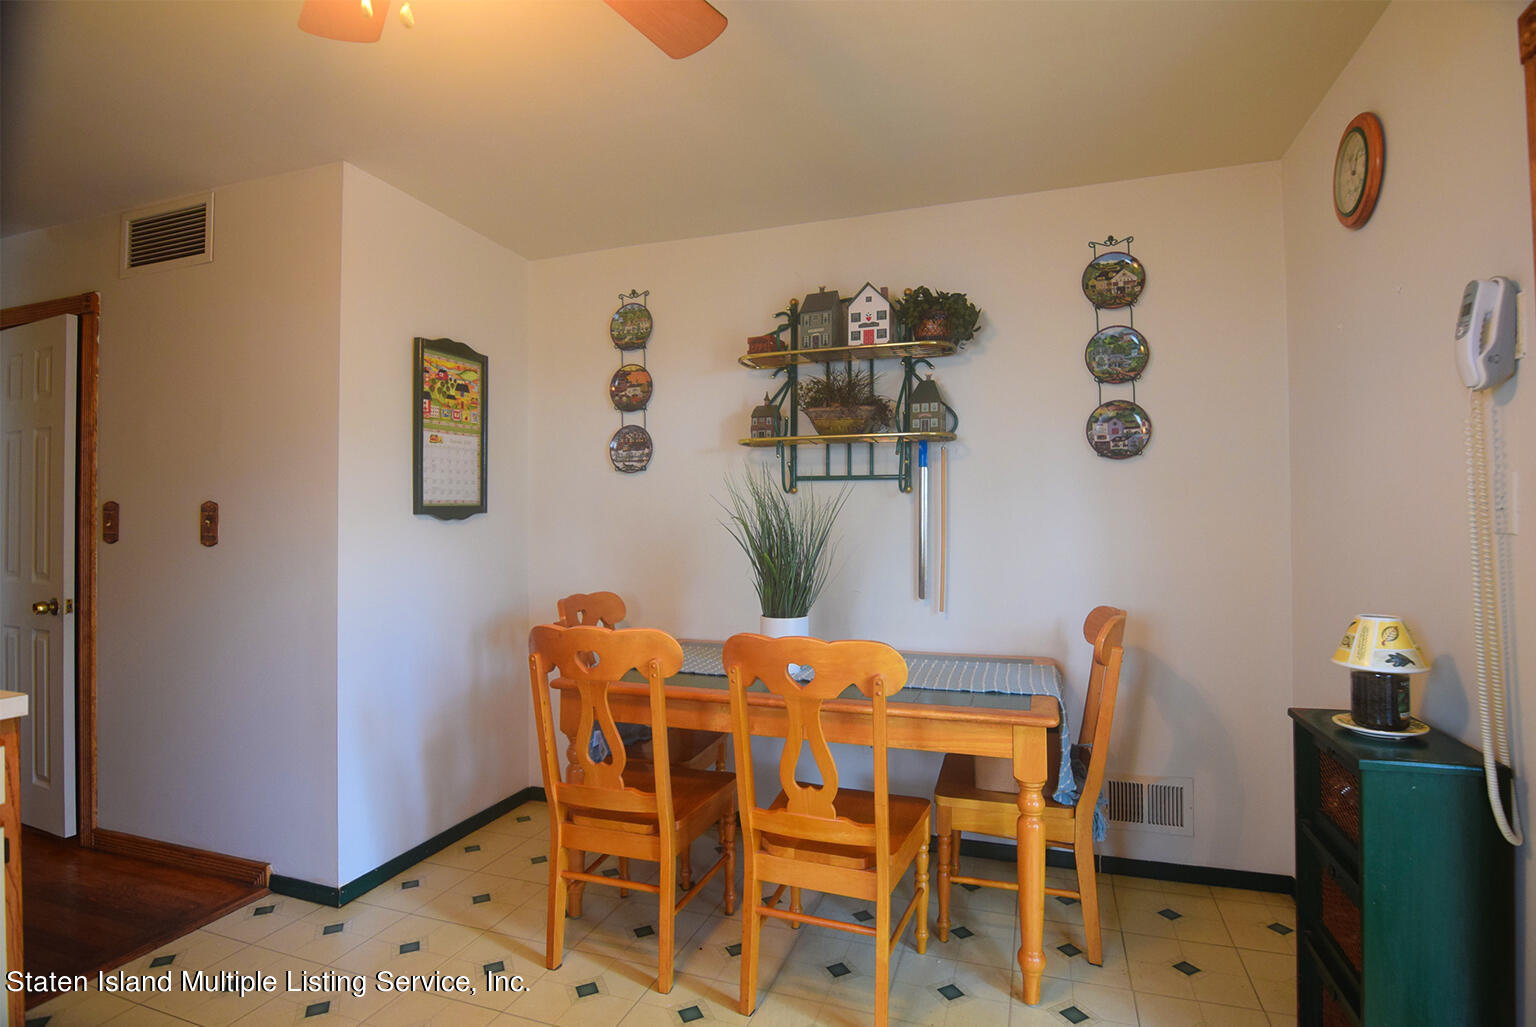 Single Family - Semi-Attached 524 Tennyson Drive  Staten Island, NY 10312, MLS-1149452-8